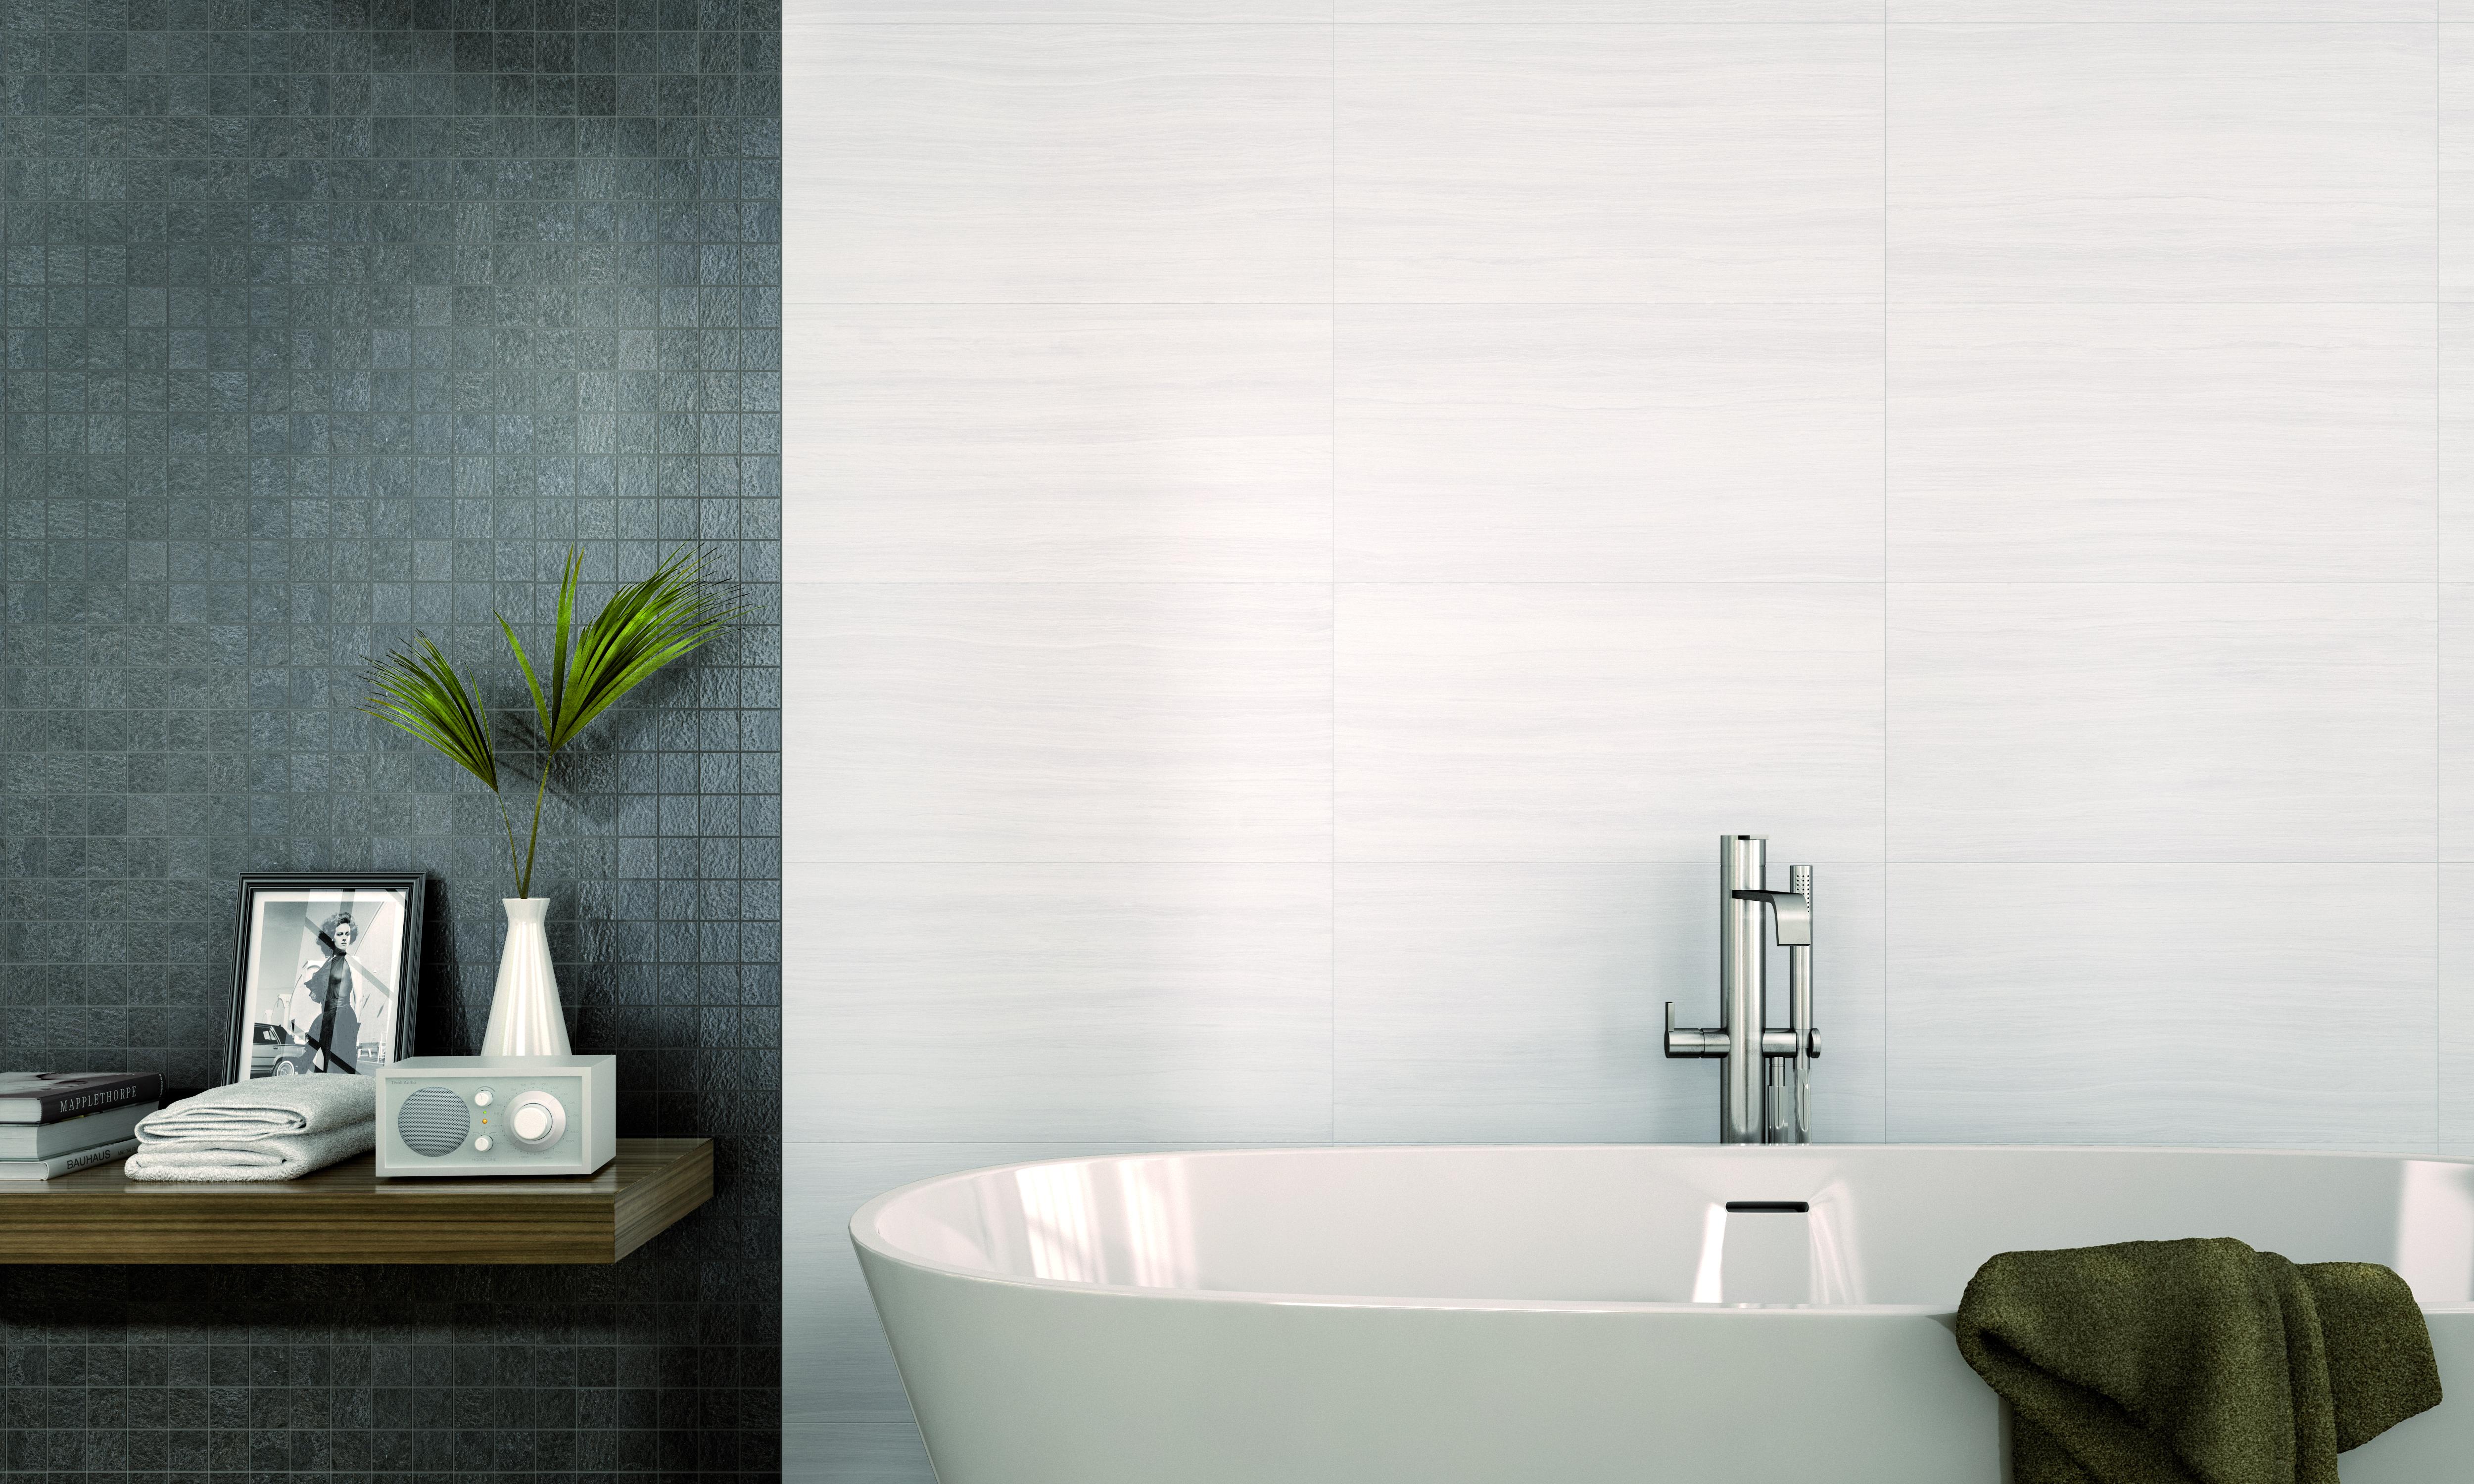 Acacia Blanco 333mm x 650mm - White Bodied Ceramic Wall Tile